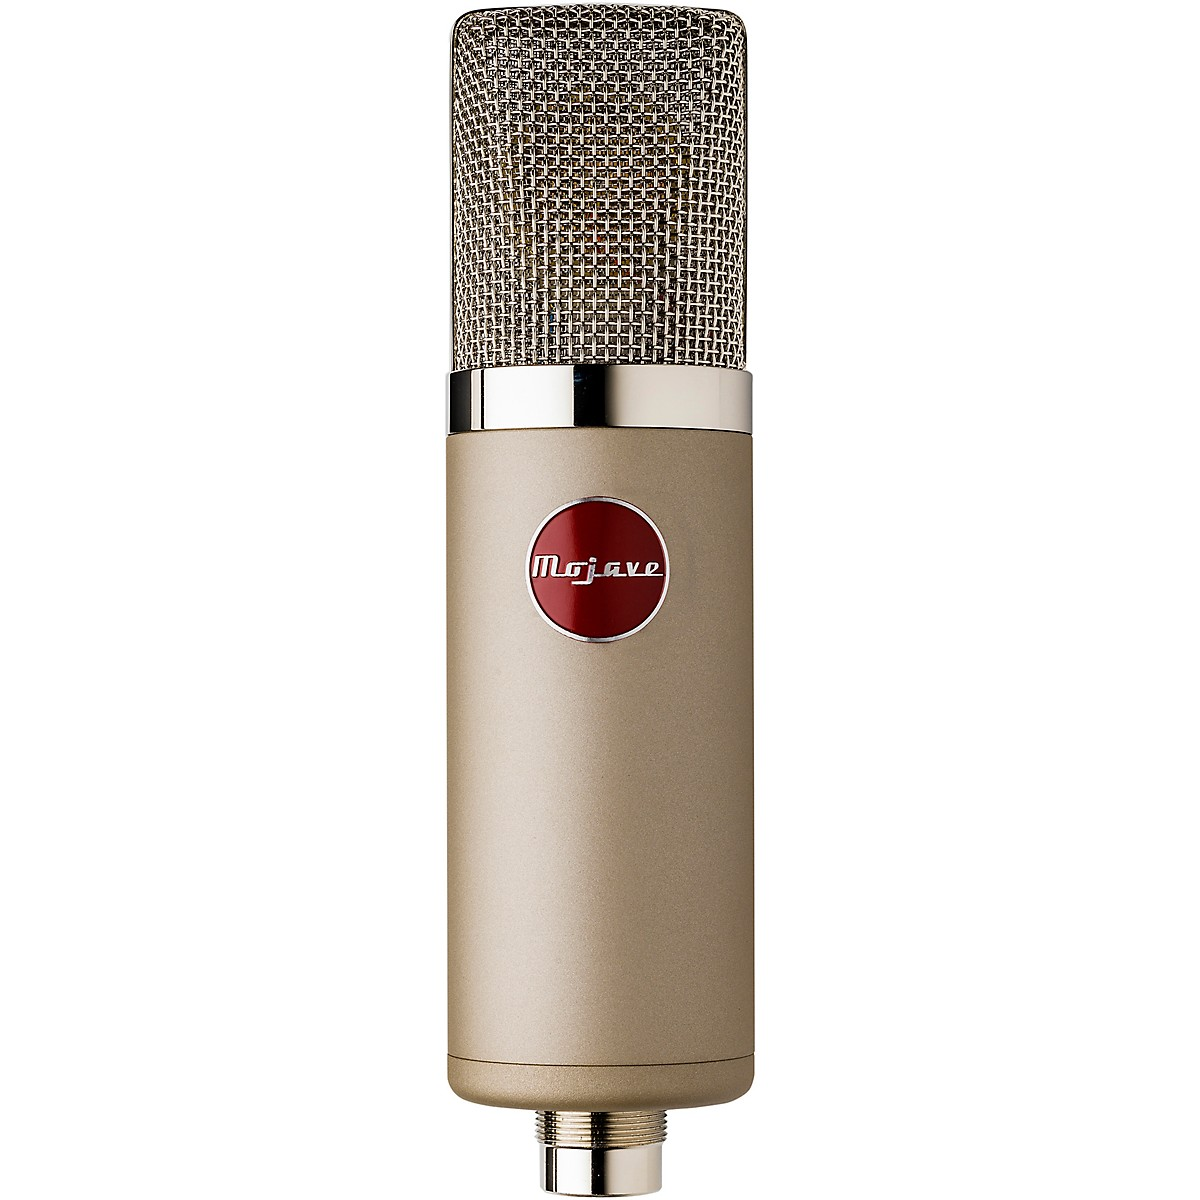 Mojave Audio MA-300SN Large-Diaphragm Multi-Pattern Tube Condenser Microphone - Satin Nickel